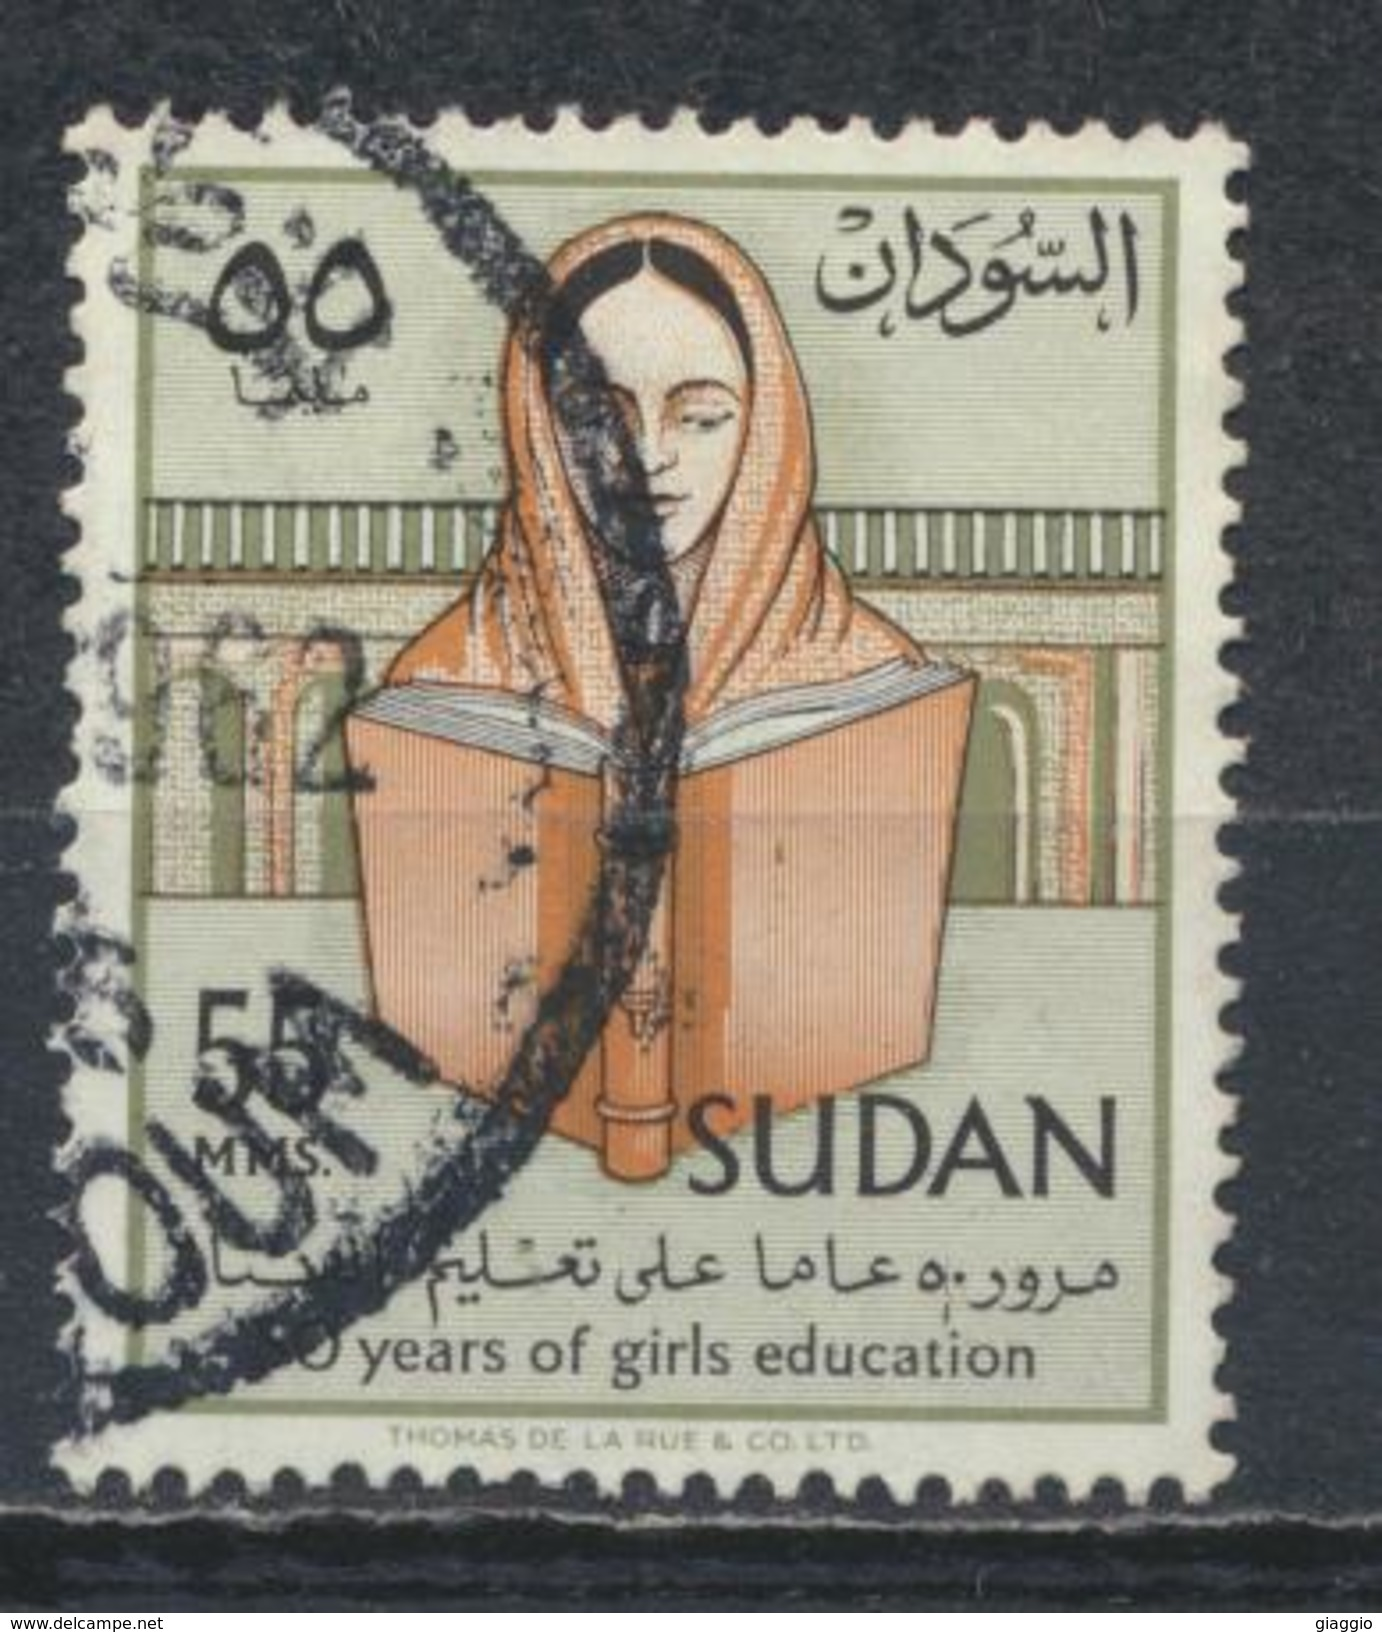 °°° LOT SUDAN SOUDAN - Y&T N°139 - 1961 °°° - Sudan (1954-...)